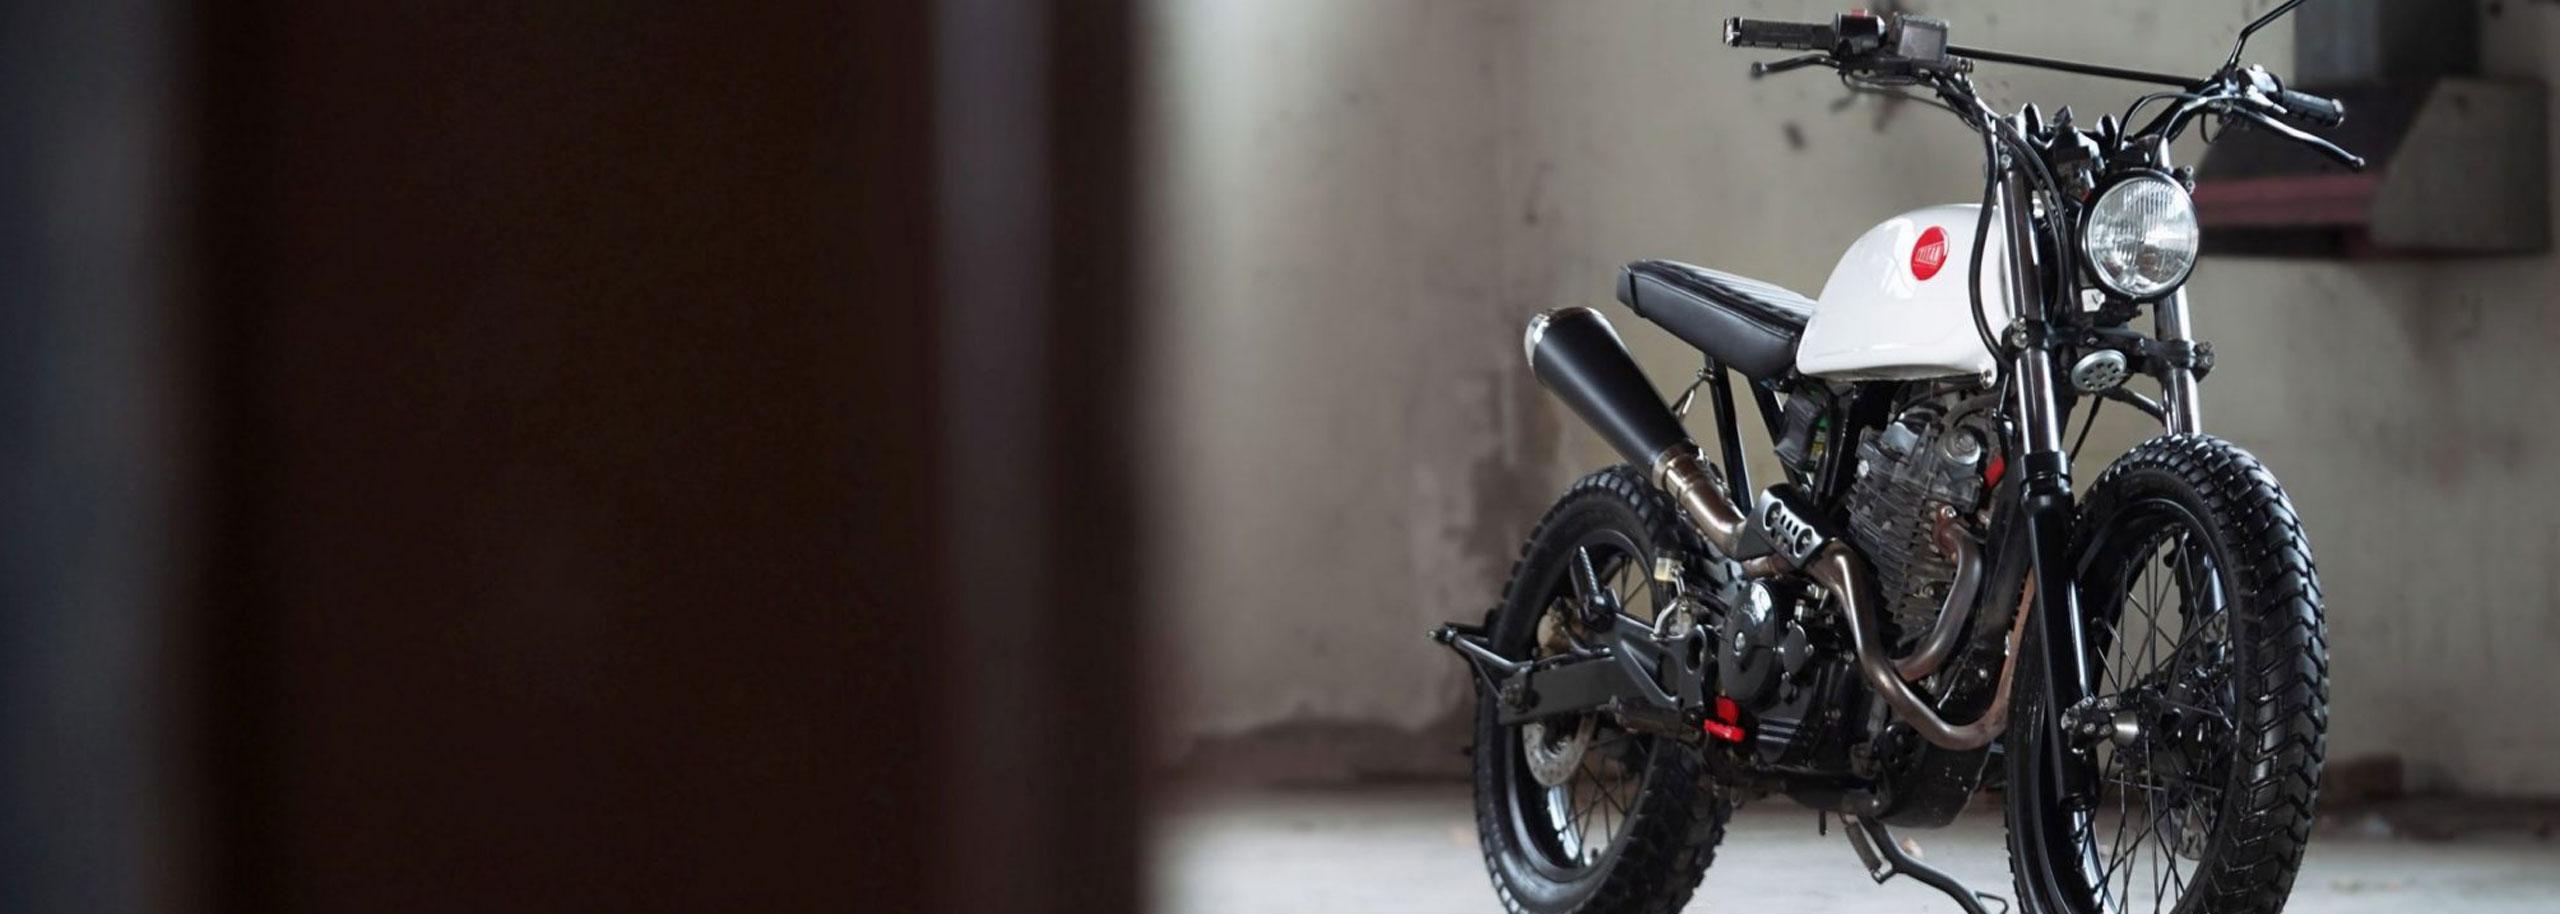 02_TITAN-Duet-of-Trackers-Honda-Umbau-Graz-Tracker-Scrambler-Cafe-Racer-SLR-650-Vigor-Styiran-Design